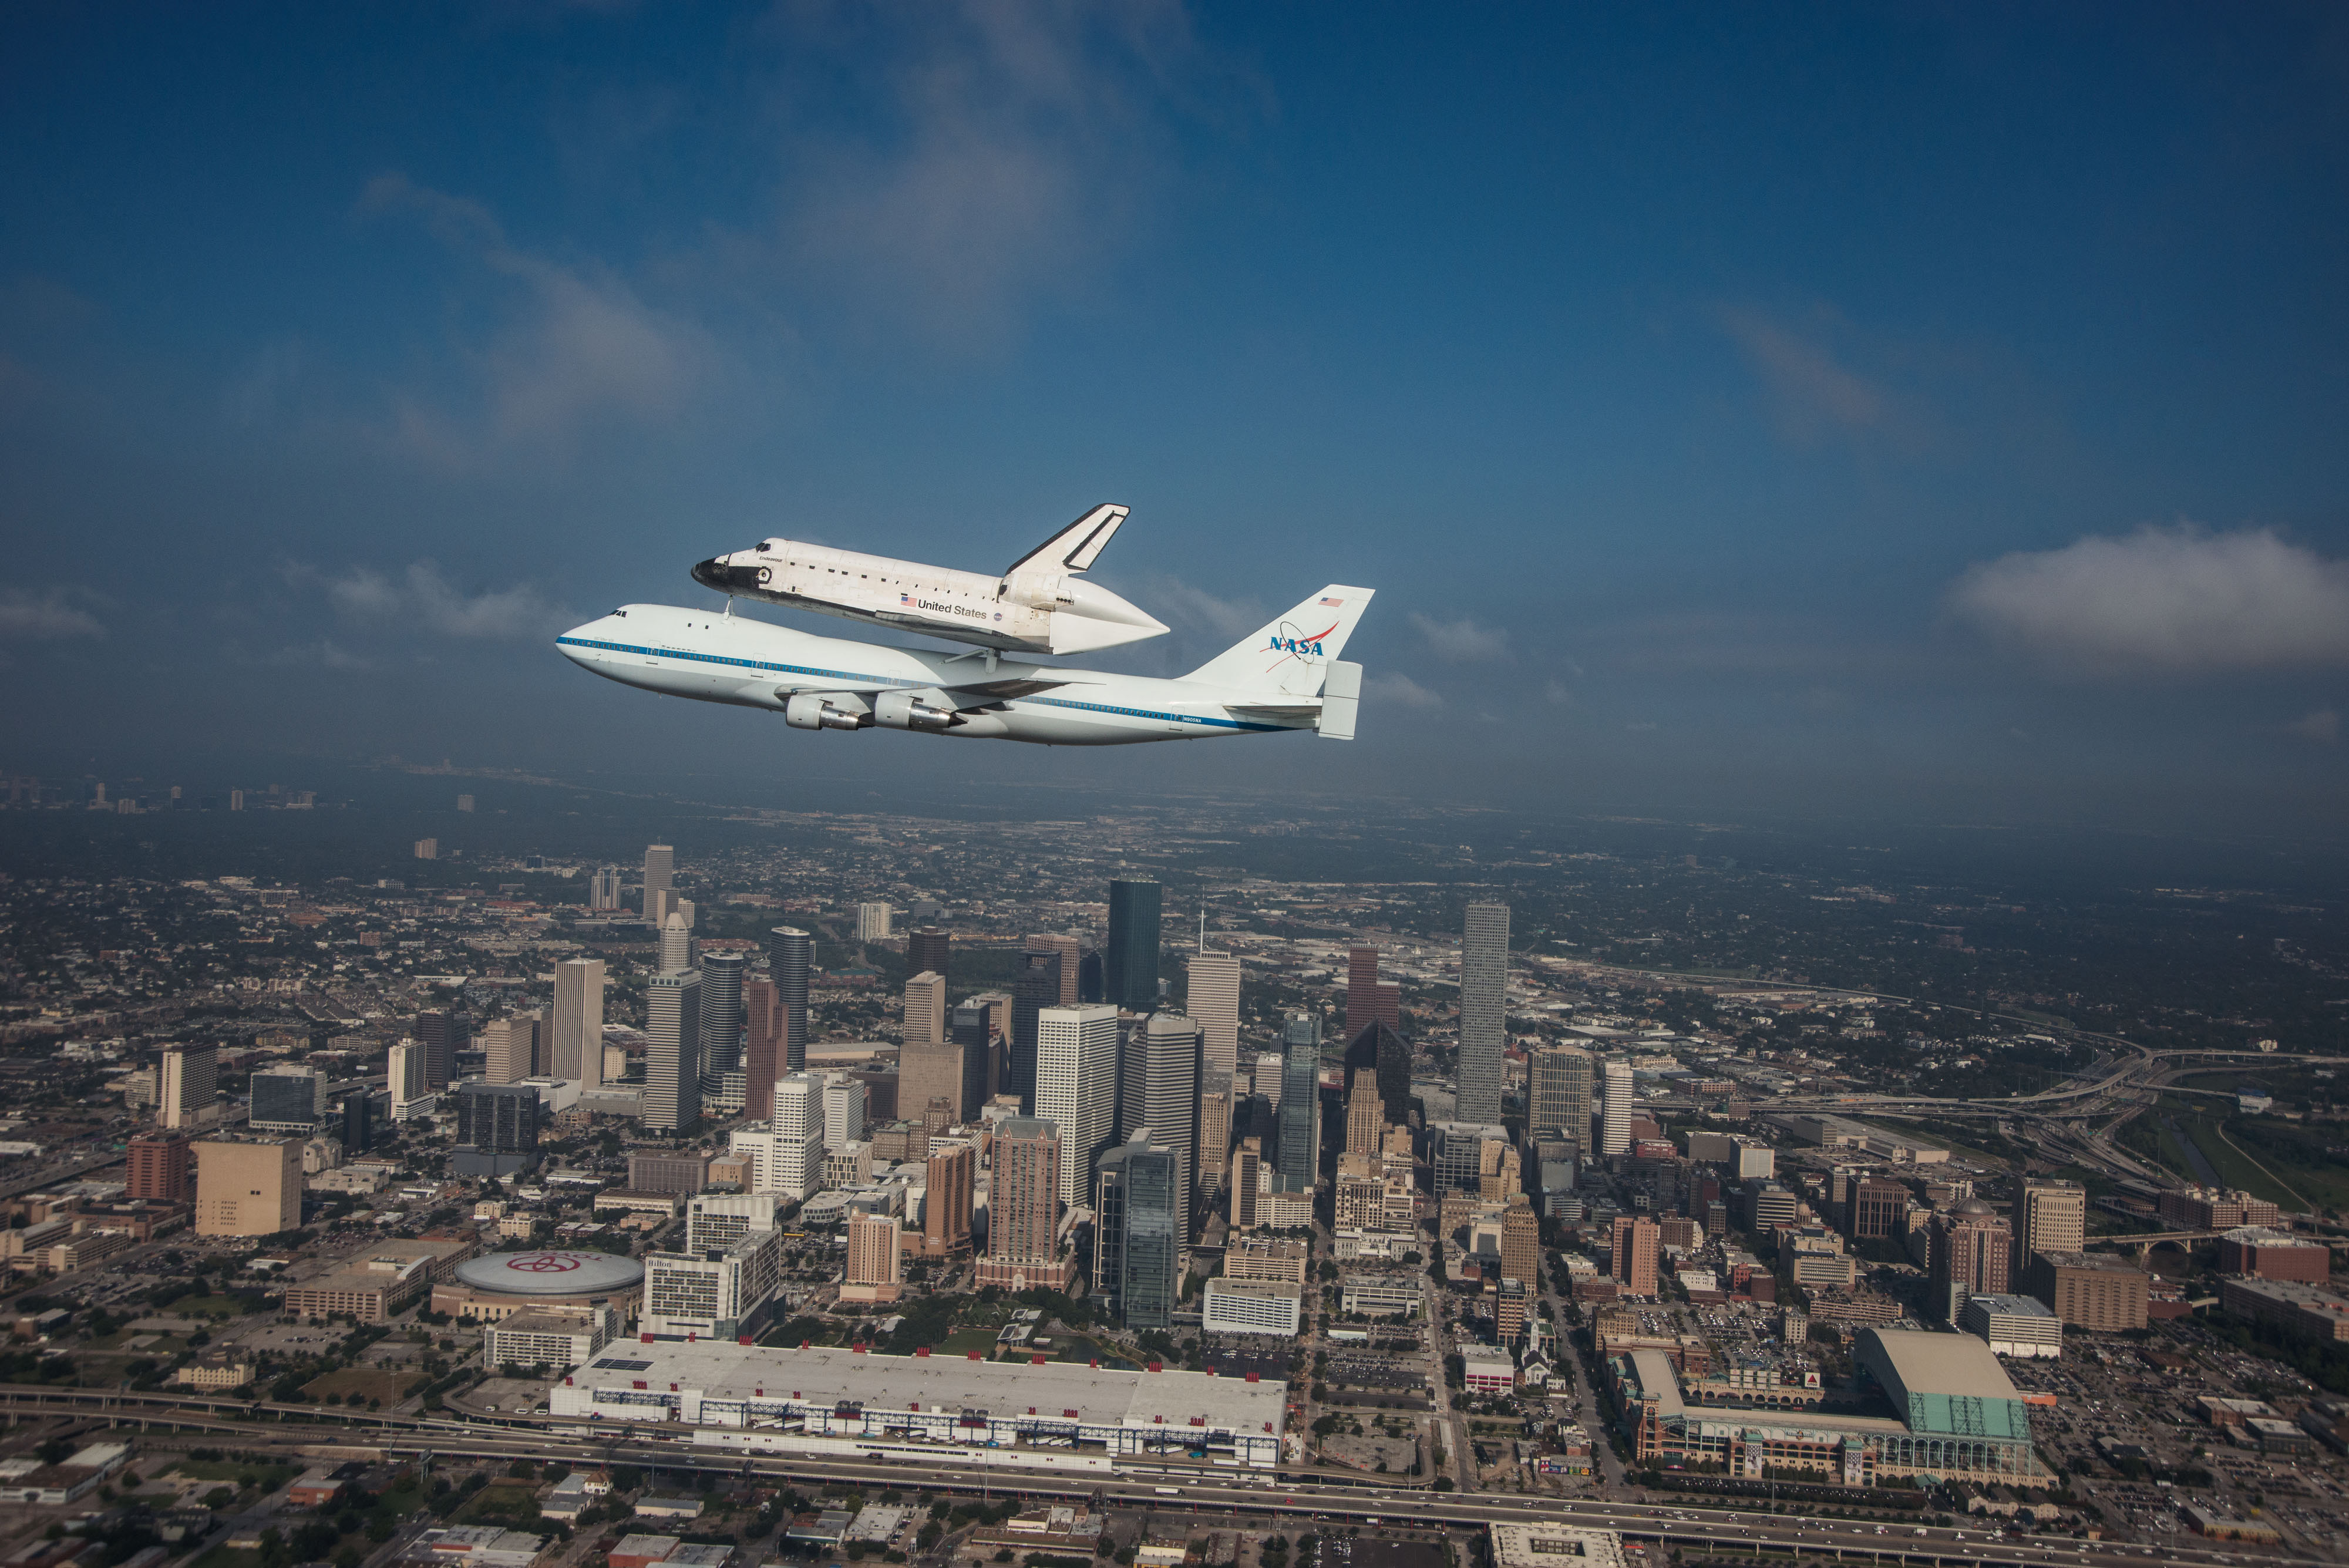 Nasa Space Shuttle Launch 2012